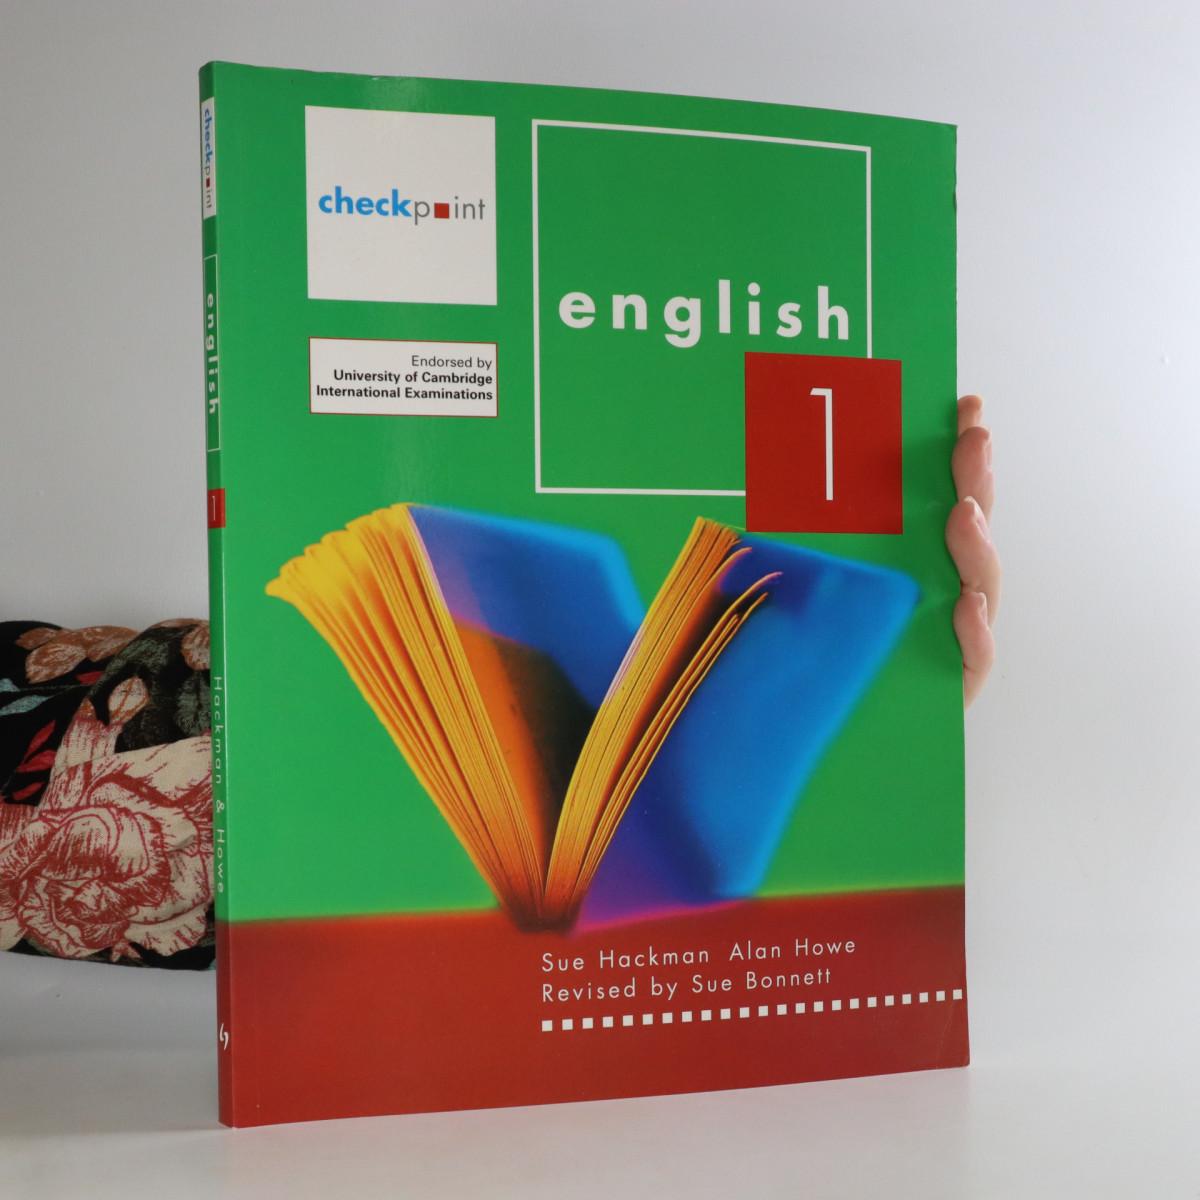 antikvární kniha Checkpoint English 1, 2010